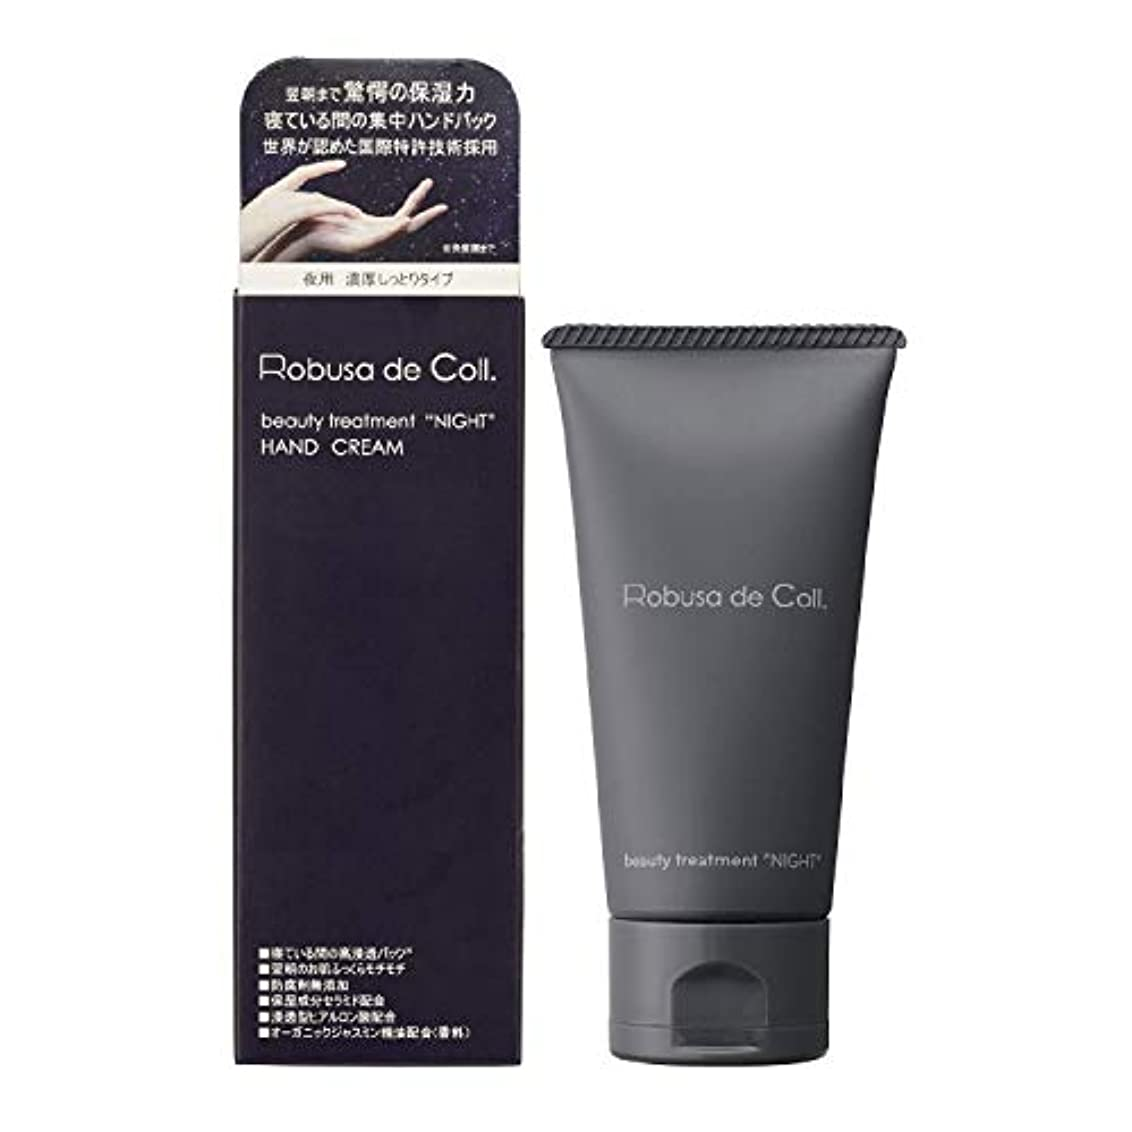 Robusa de coll(ロブサデコル)ナイトリペアクリーム 60g (皮膚保護クリーム 乾燥 敏感肌用)